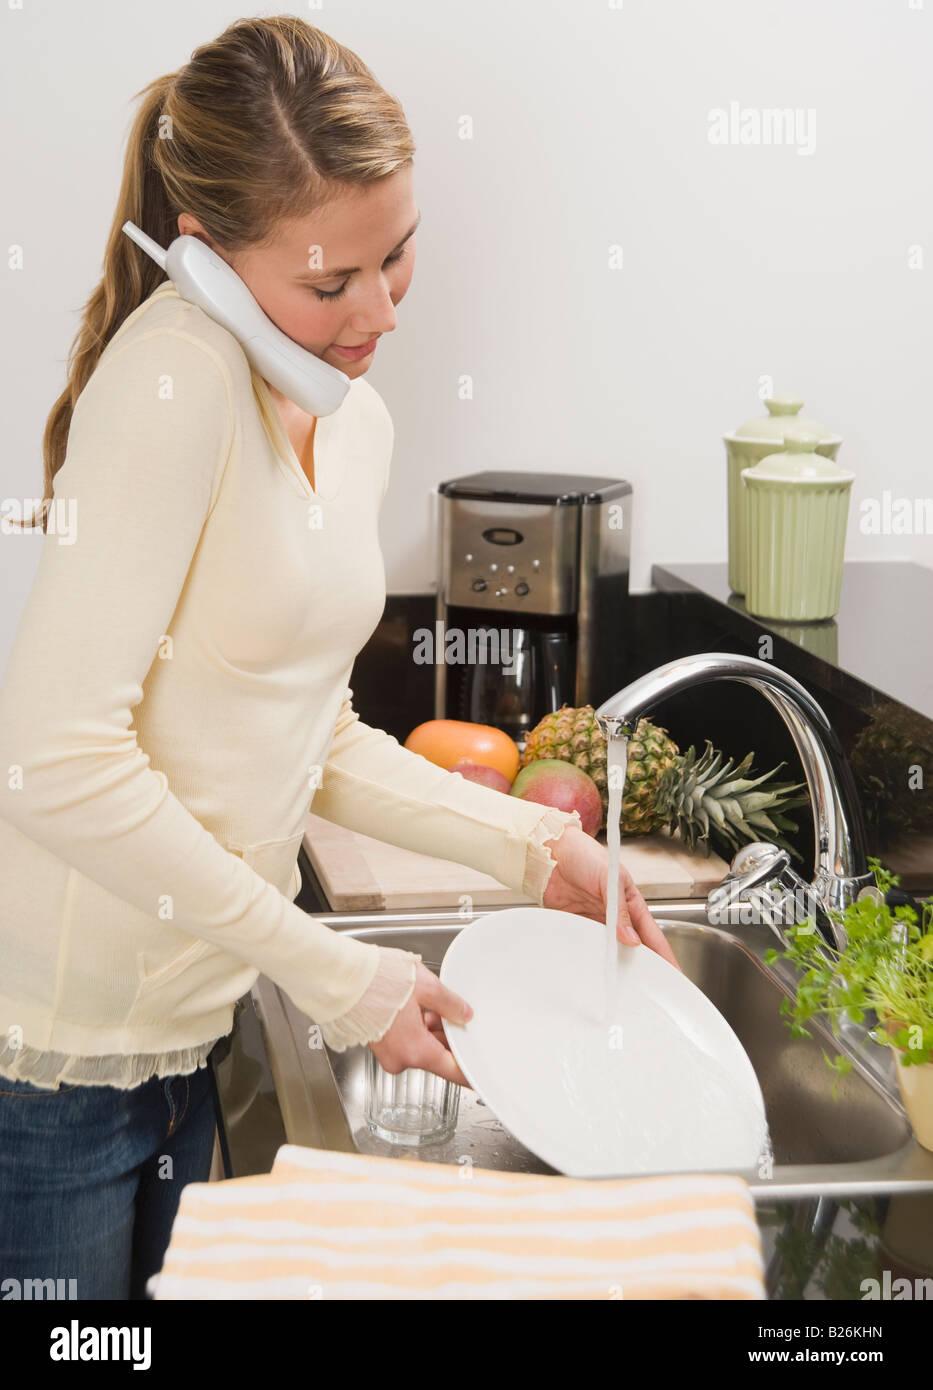 Woman washing dishes - Stock Image